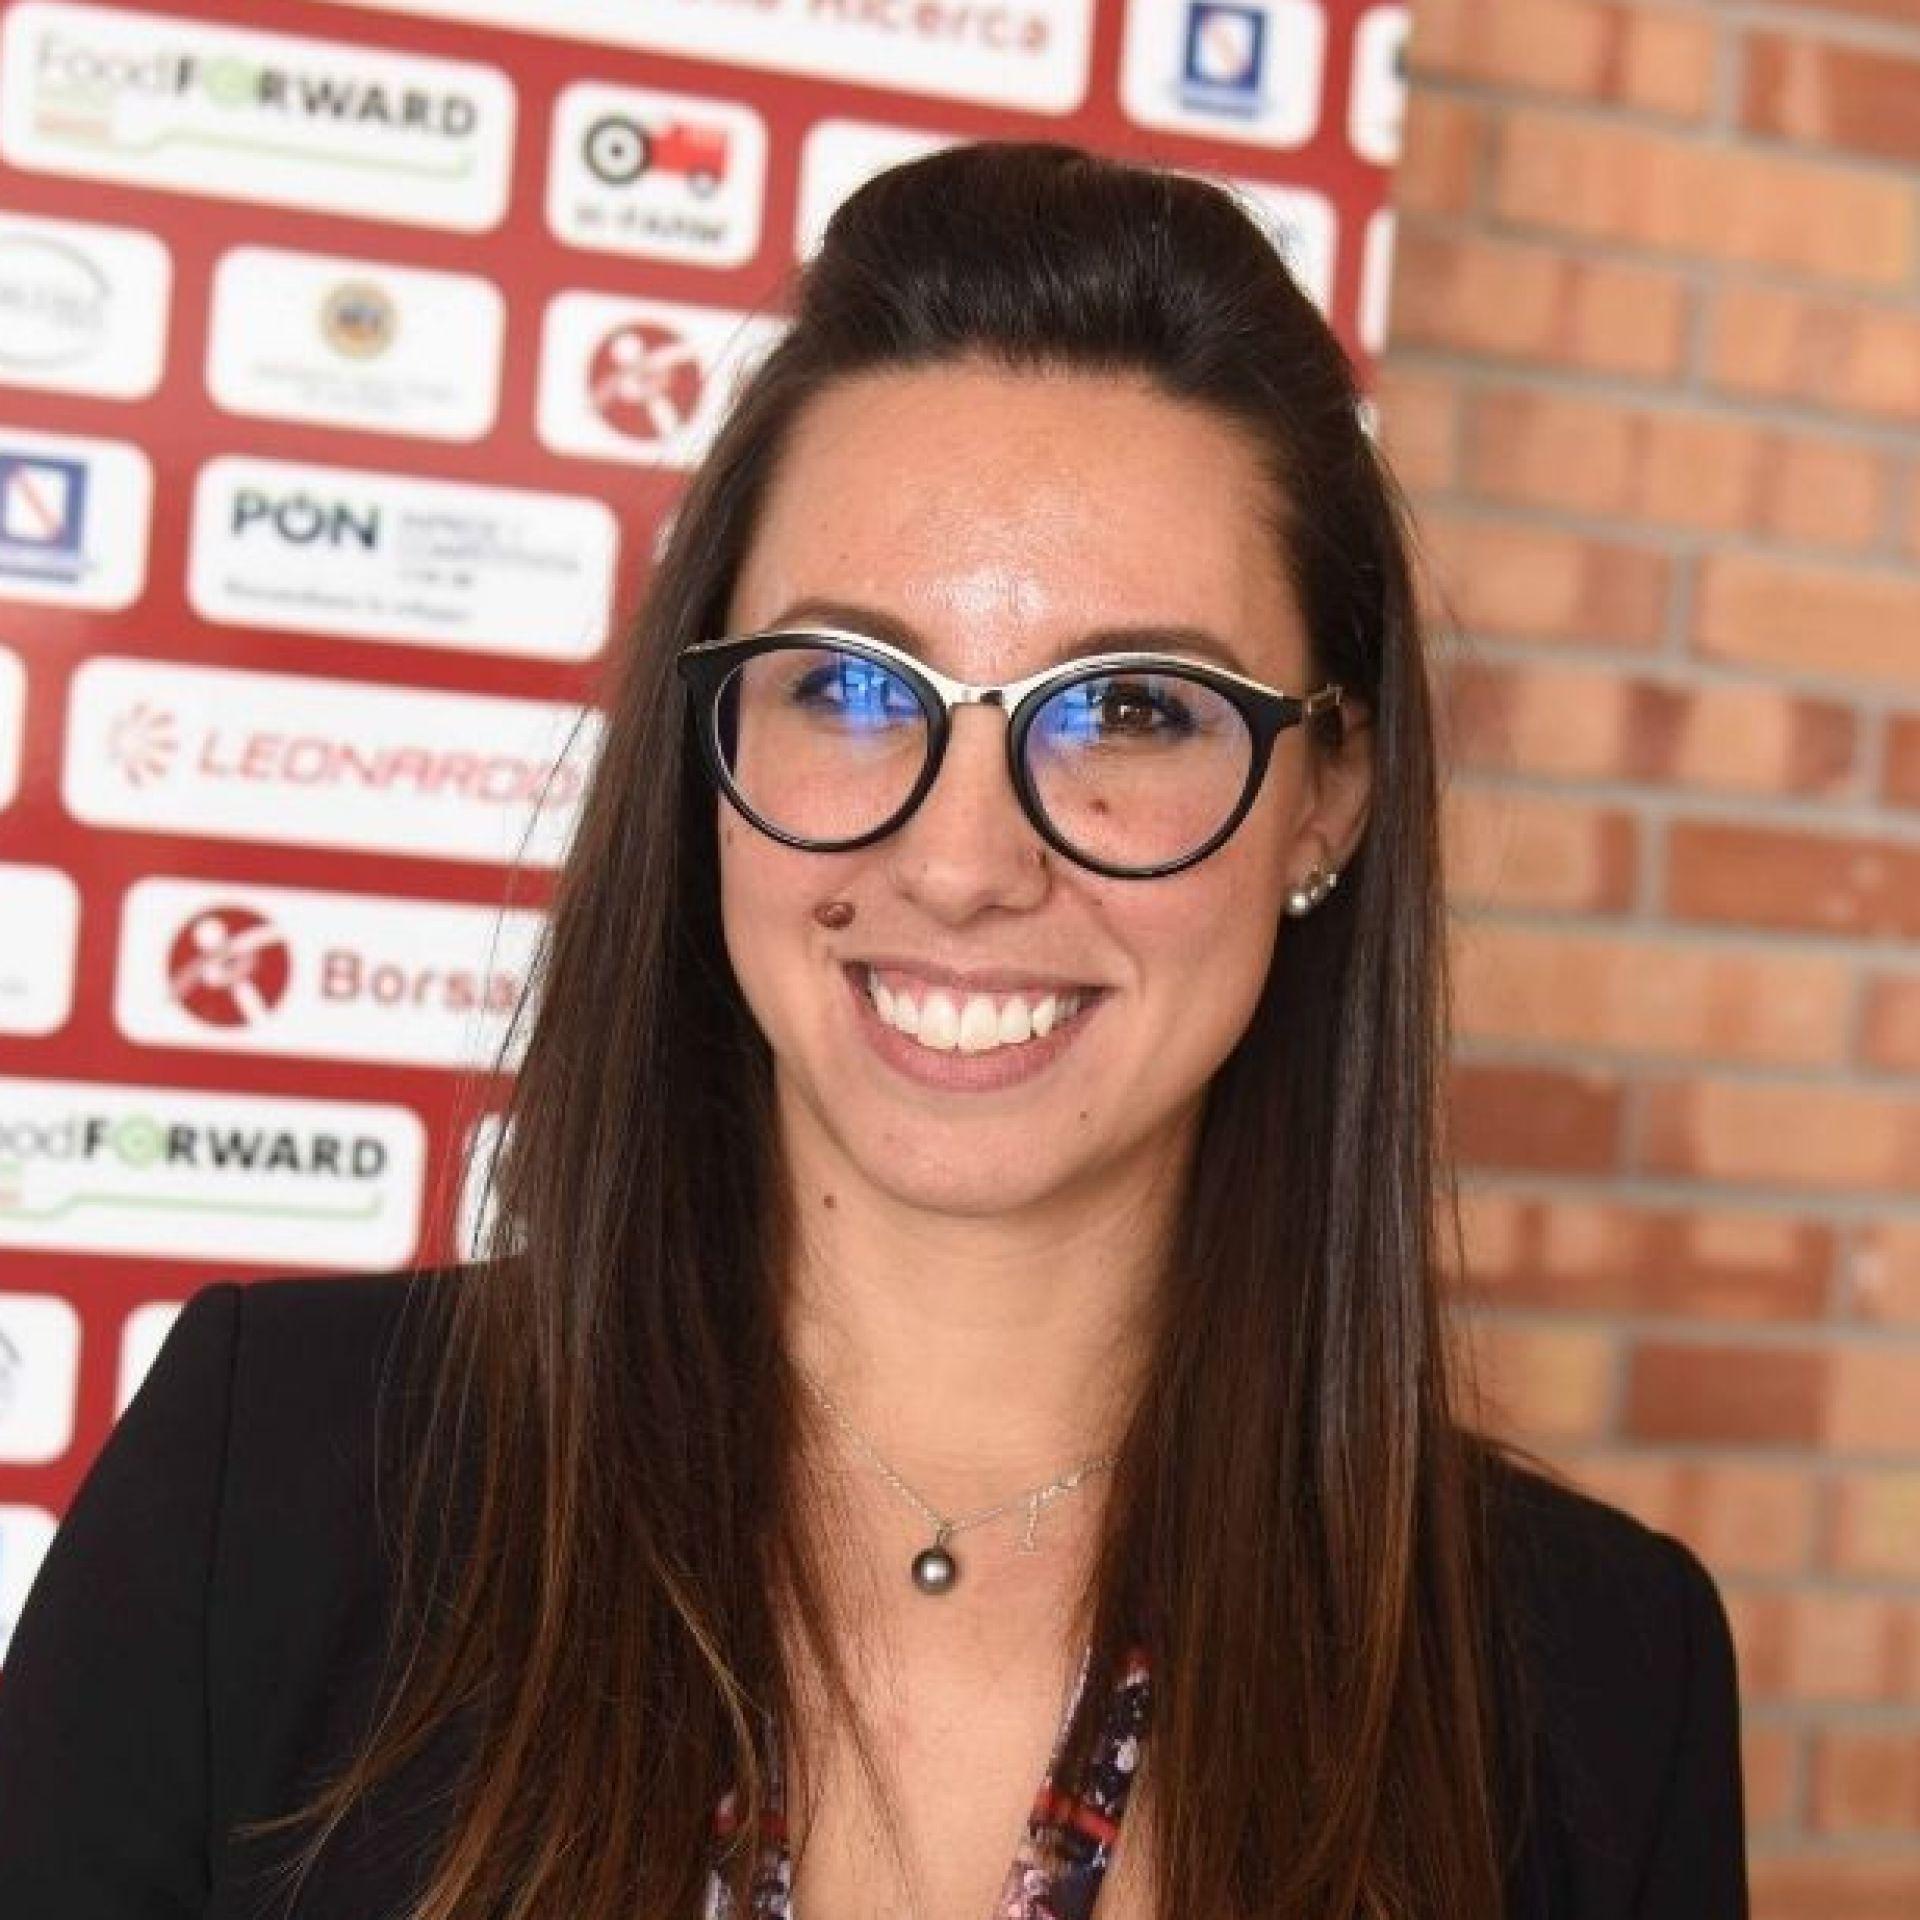 Silvia Peschiera